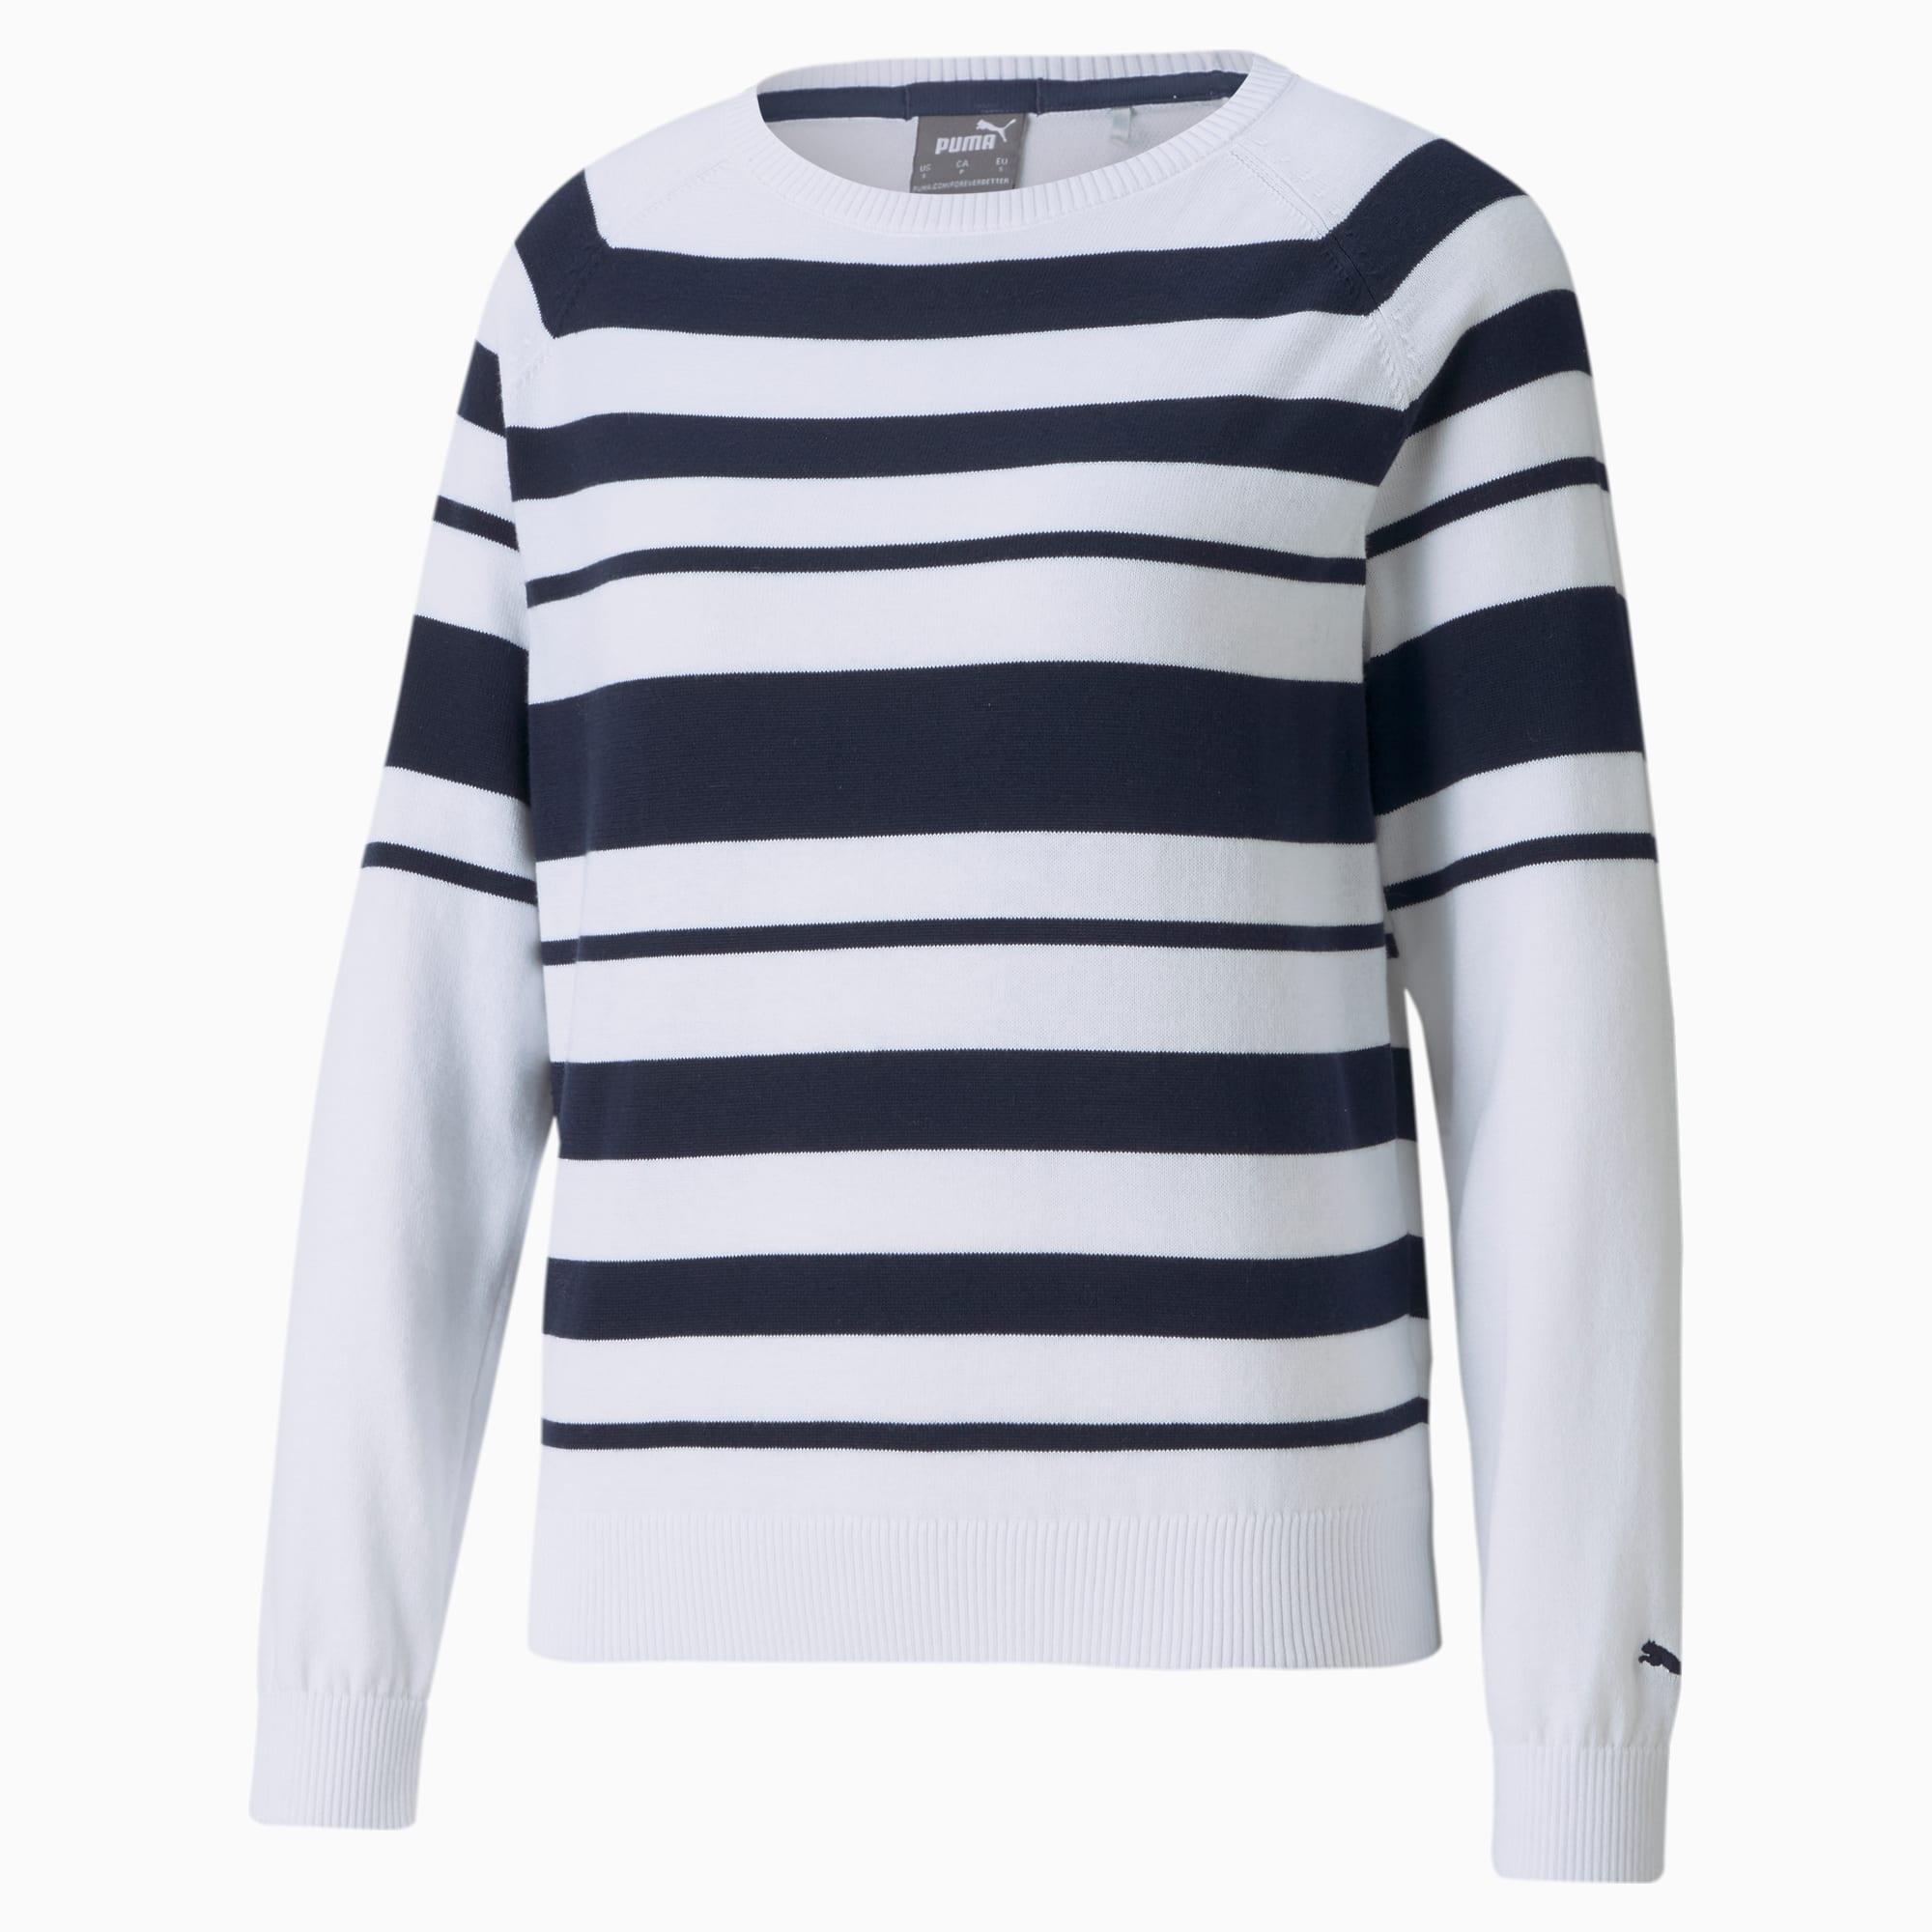 Pull de golf Ribbon , Blanc/Bleu, Taille L, Vêtements - PUMA - Modalova